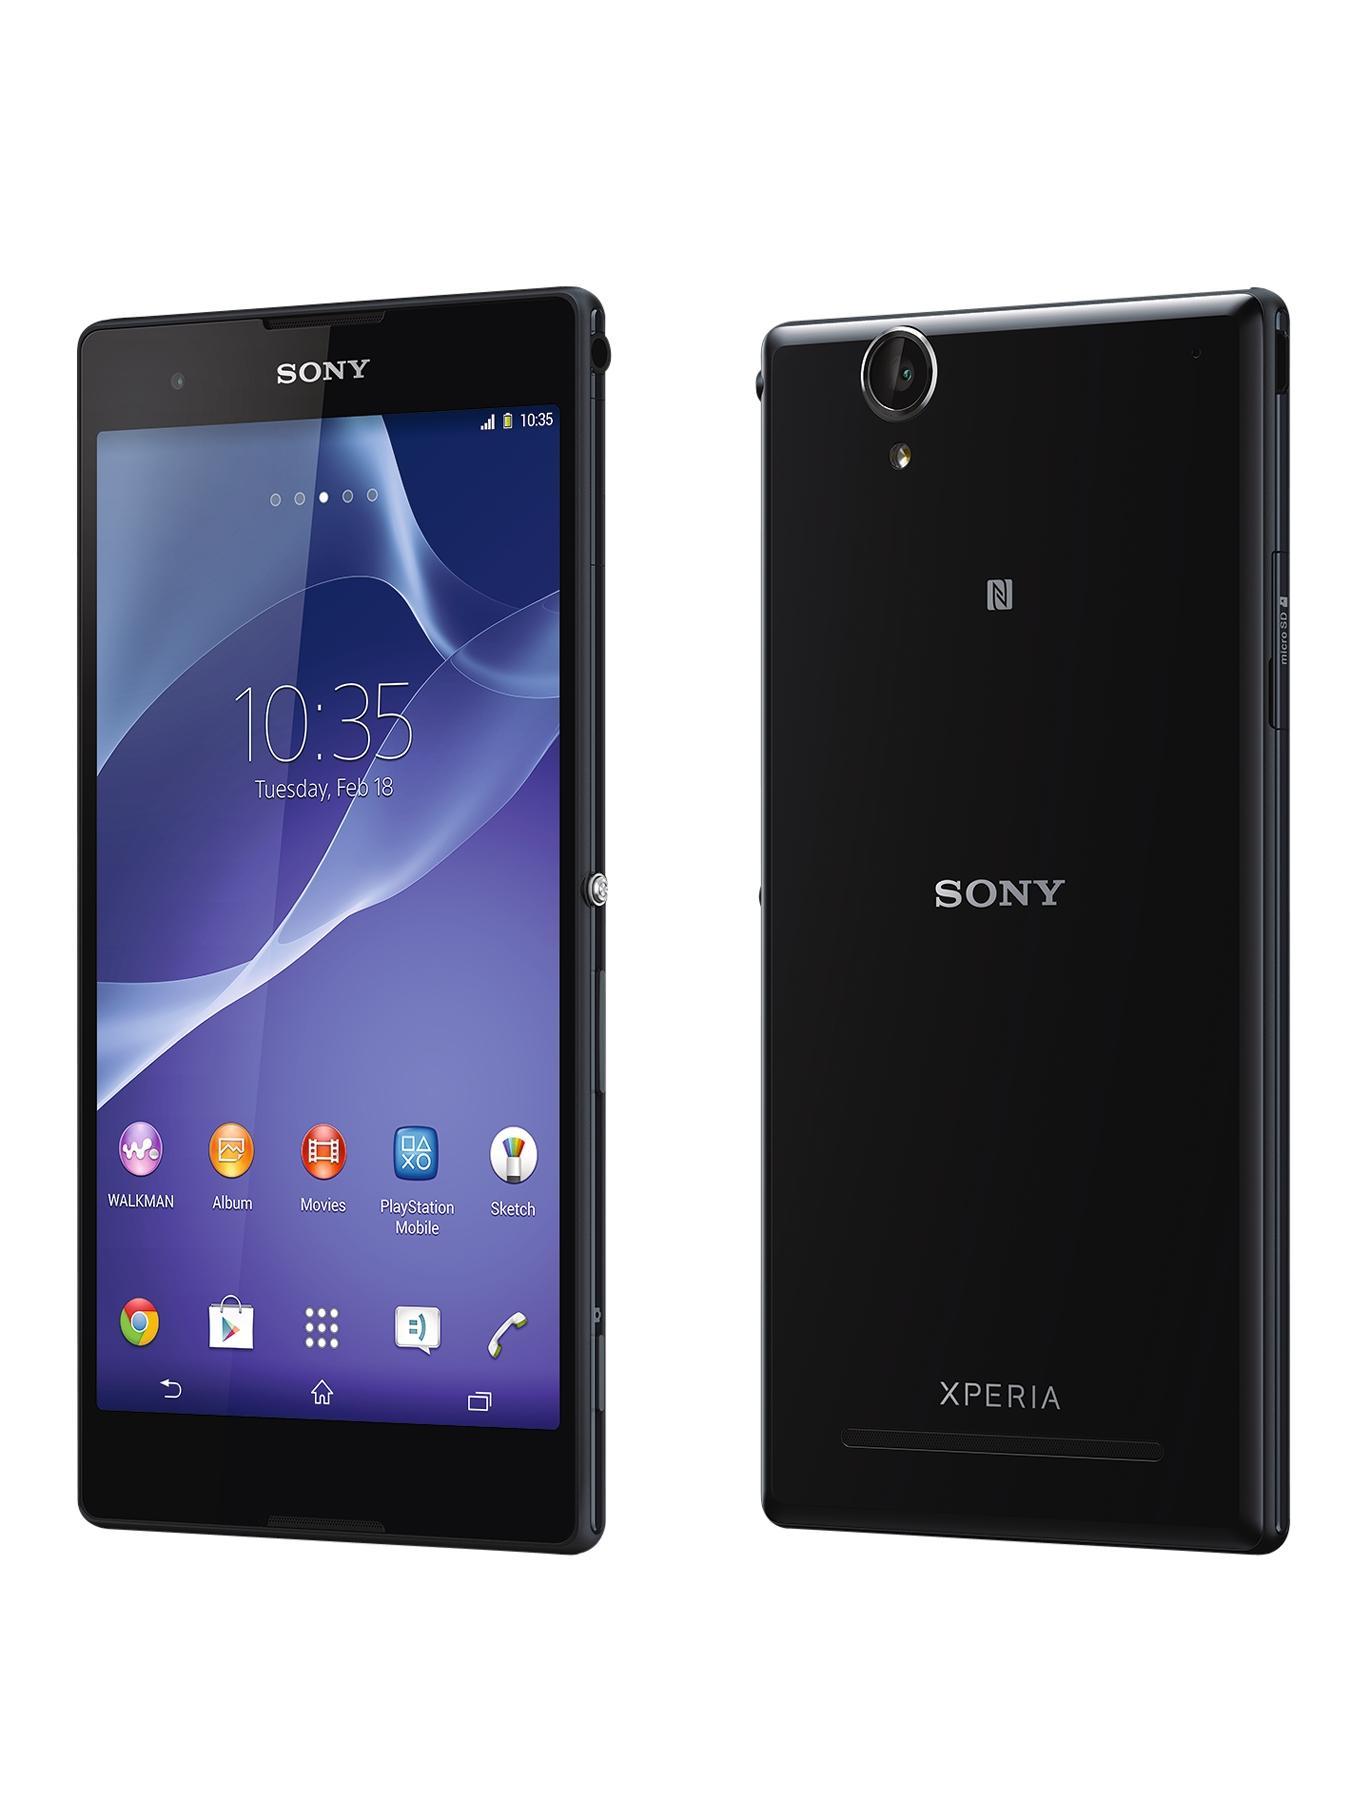 Sony Xperia T2 Ultra 6.4 inch Smartphone - Black